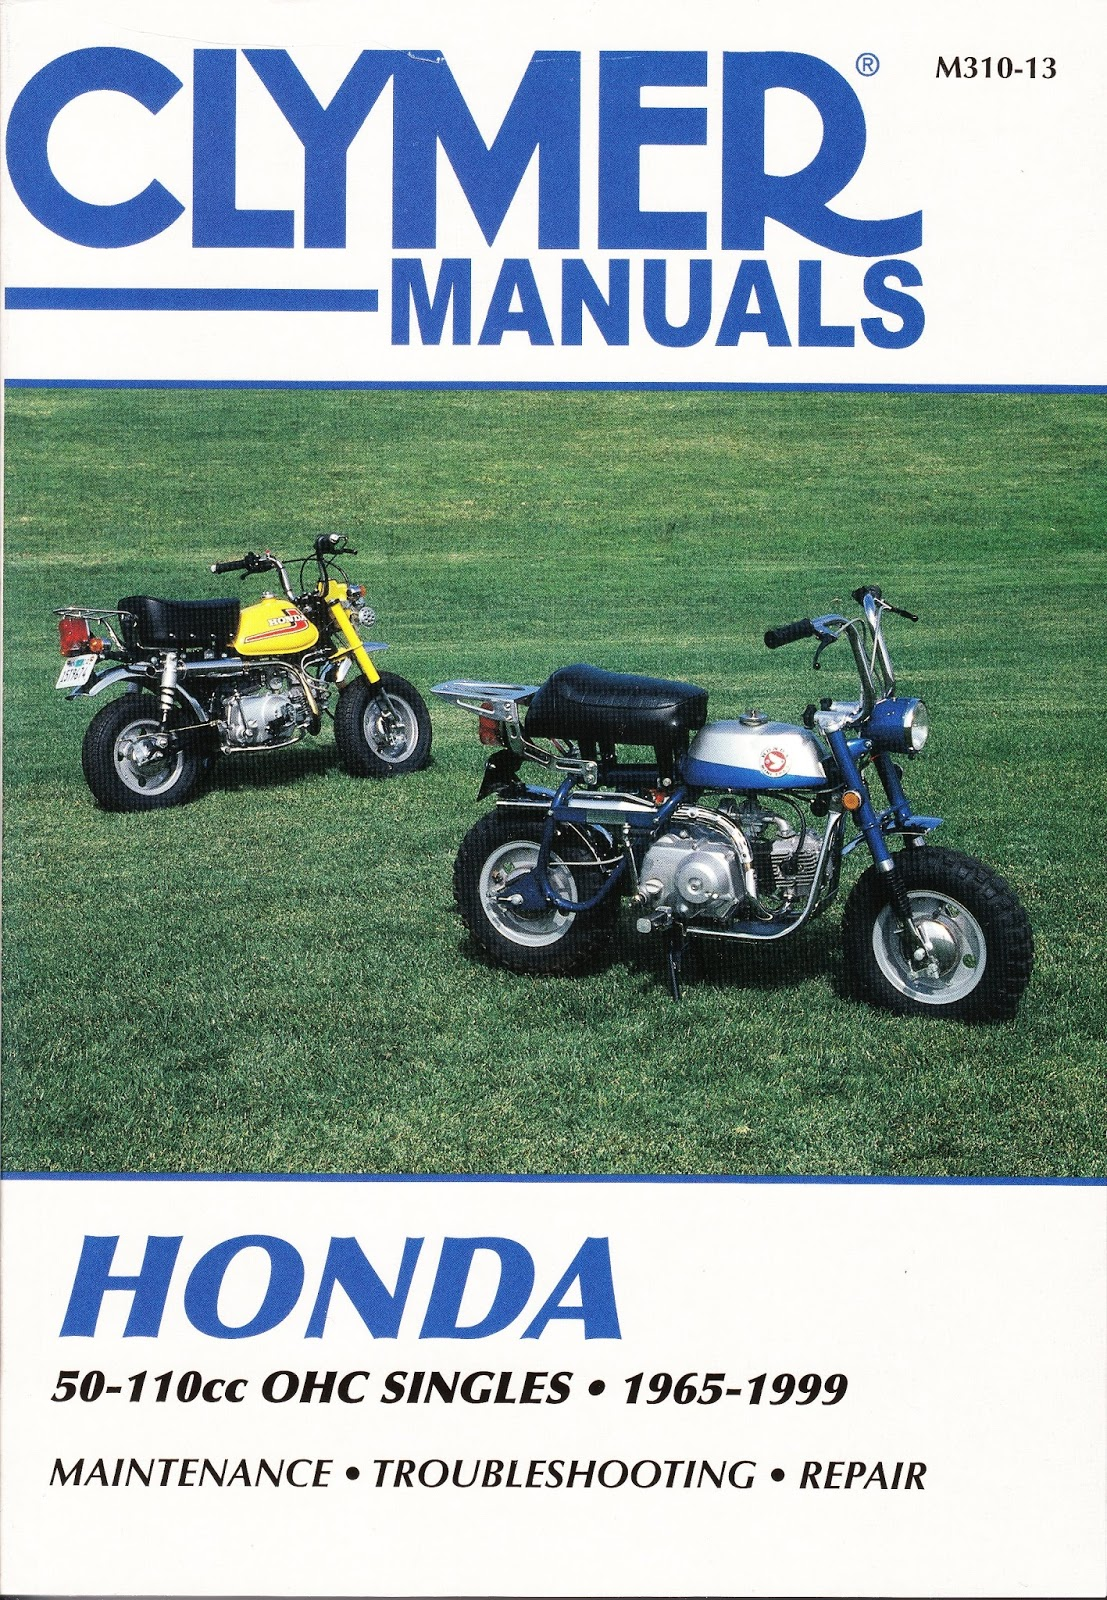 1979 Honda Z50 Schematic Wiring Data Schema 1970 Diagram Shop Manual 1968 1978 Z50r 1982 Clymer Rh Z50a Restoration Project Blogspot Com Service